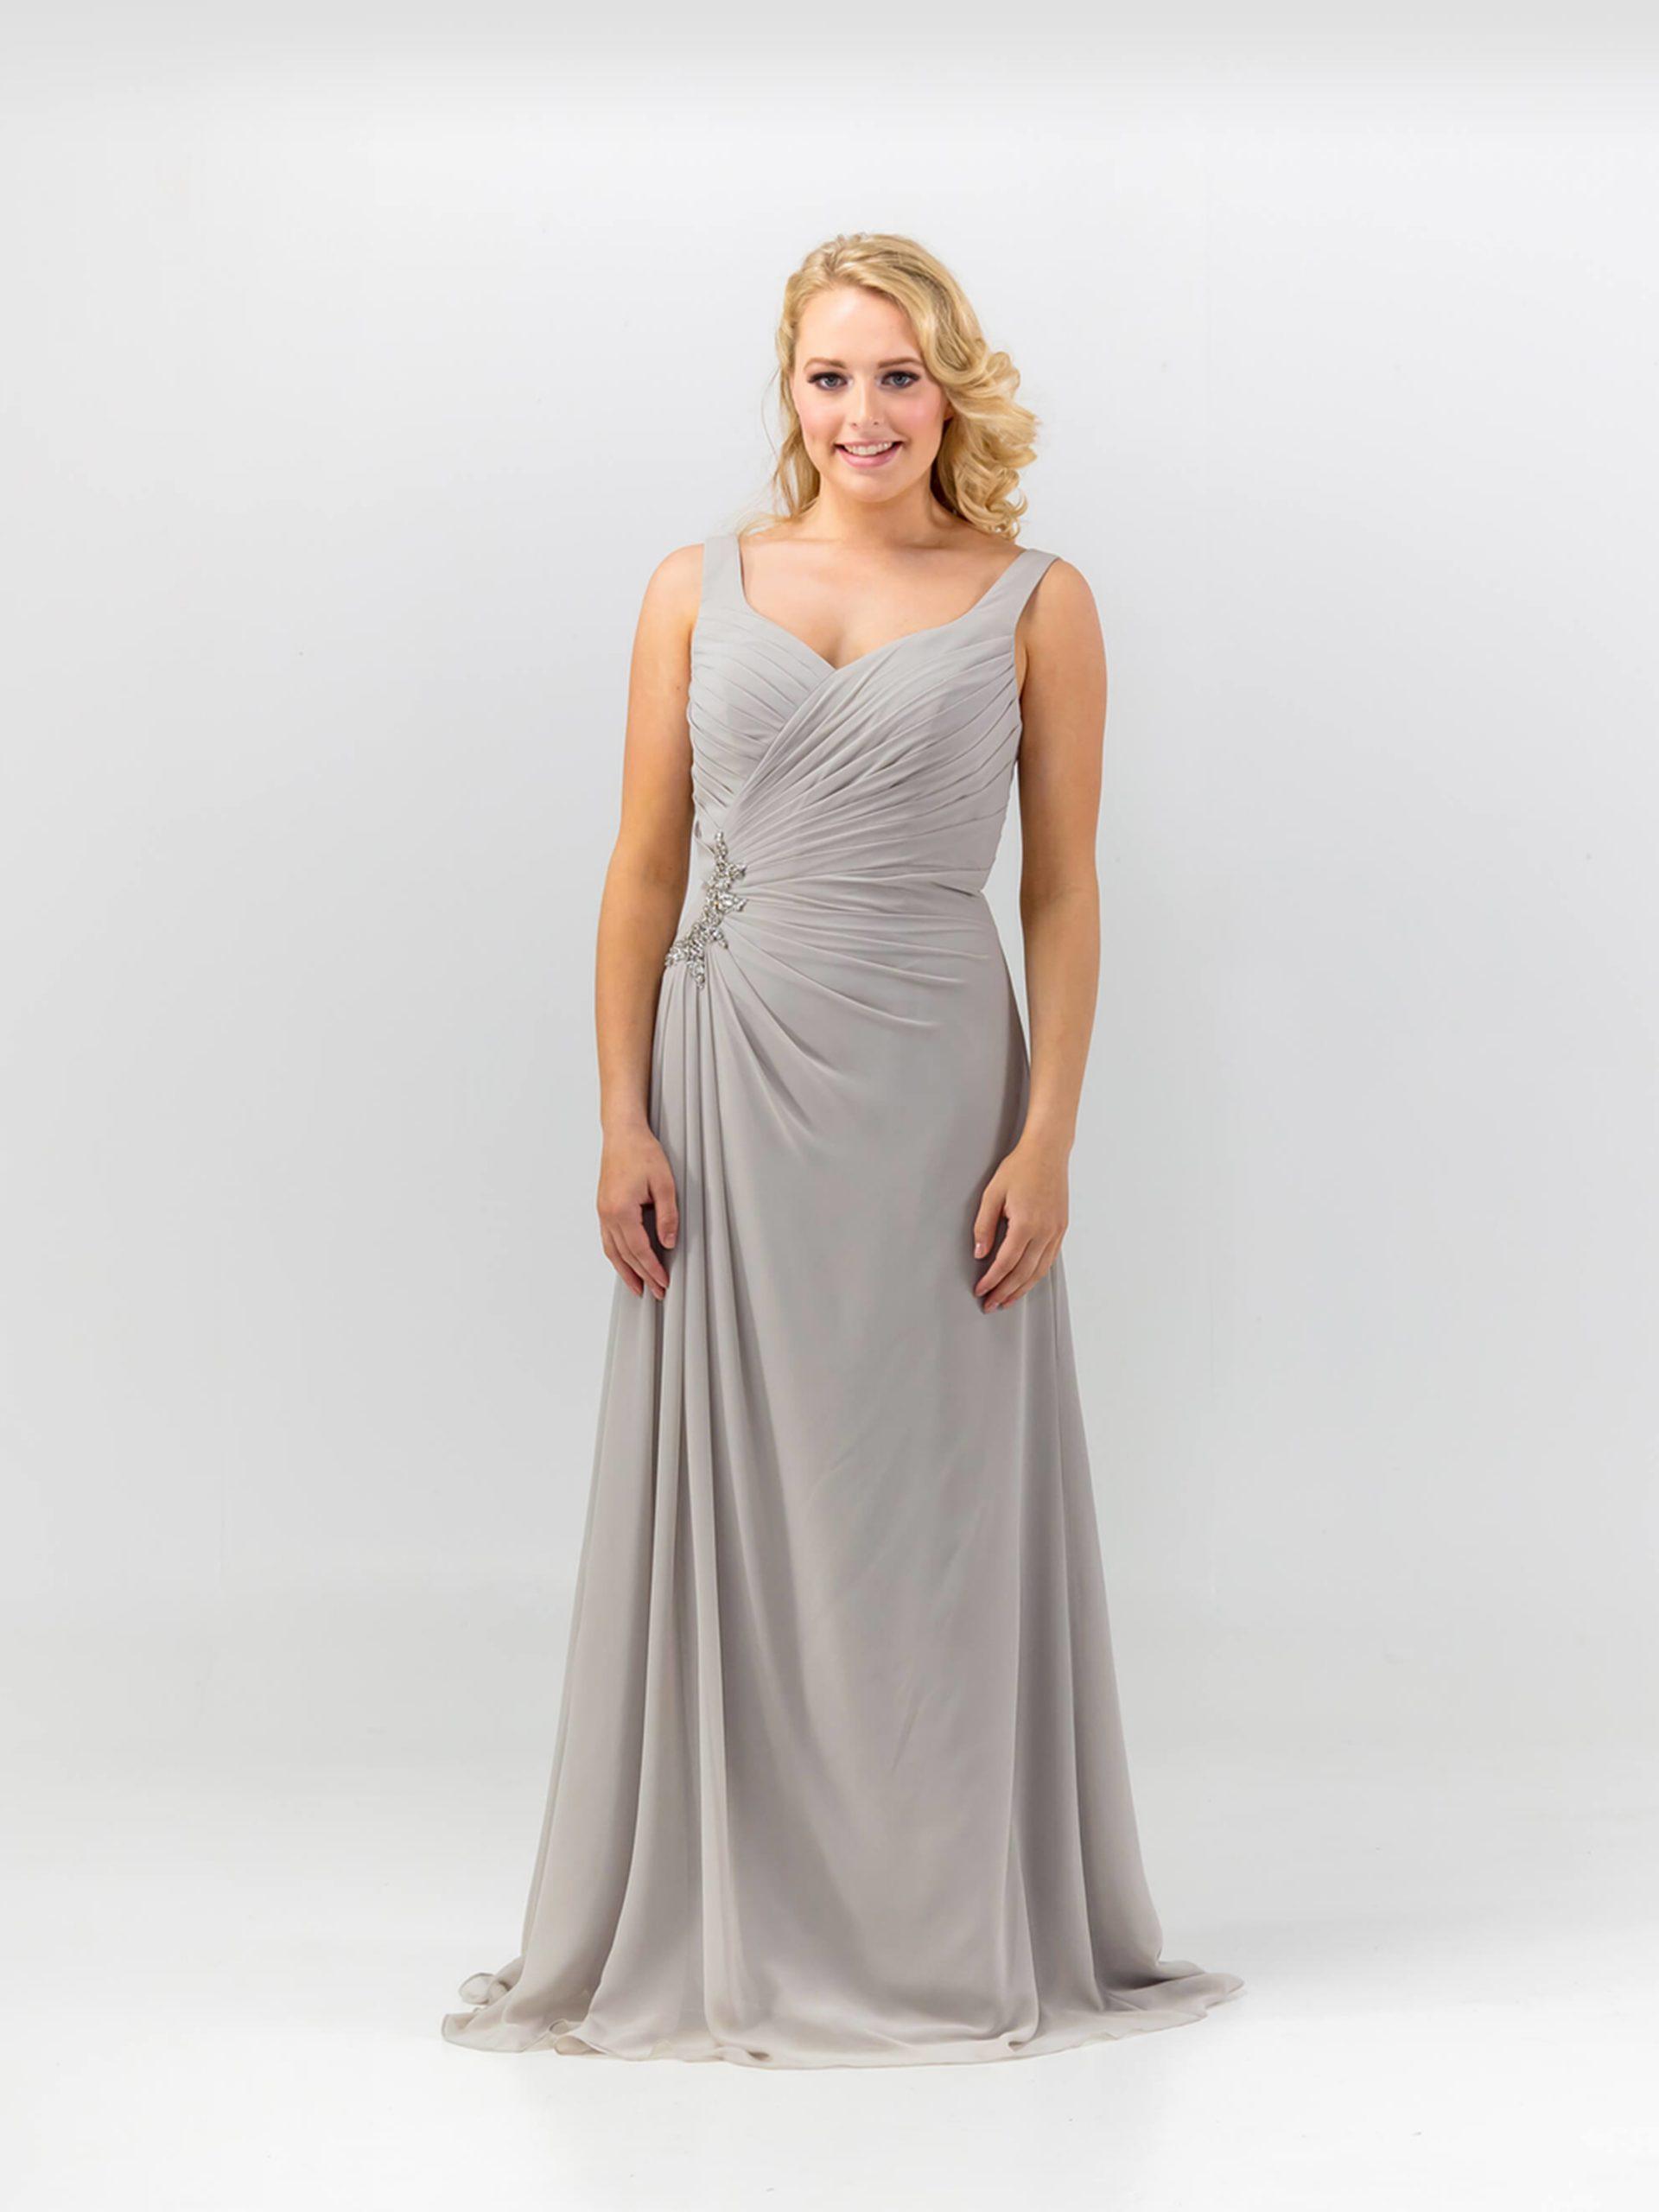 MAB05-silver chiffon bridesmaid dress 1